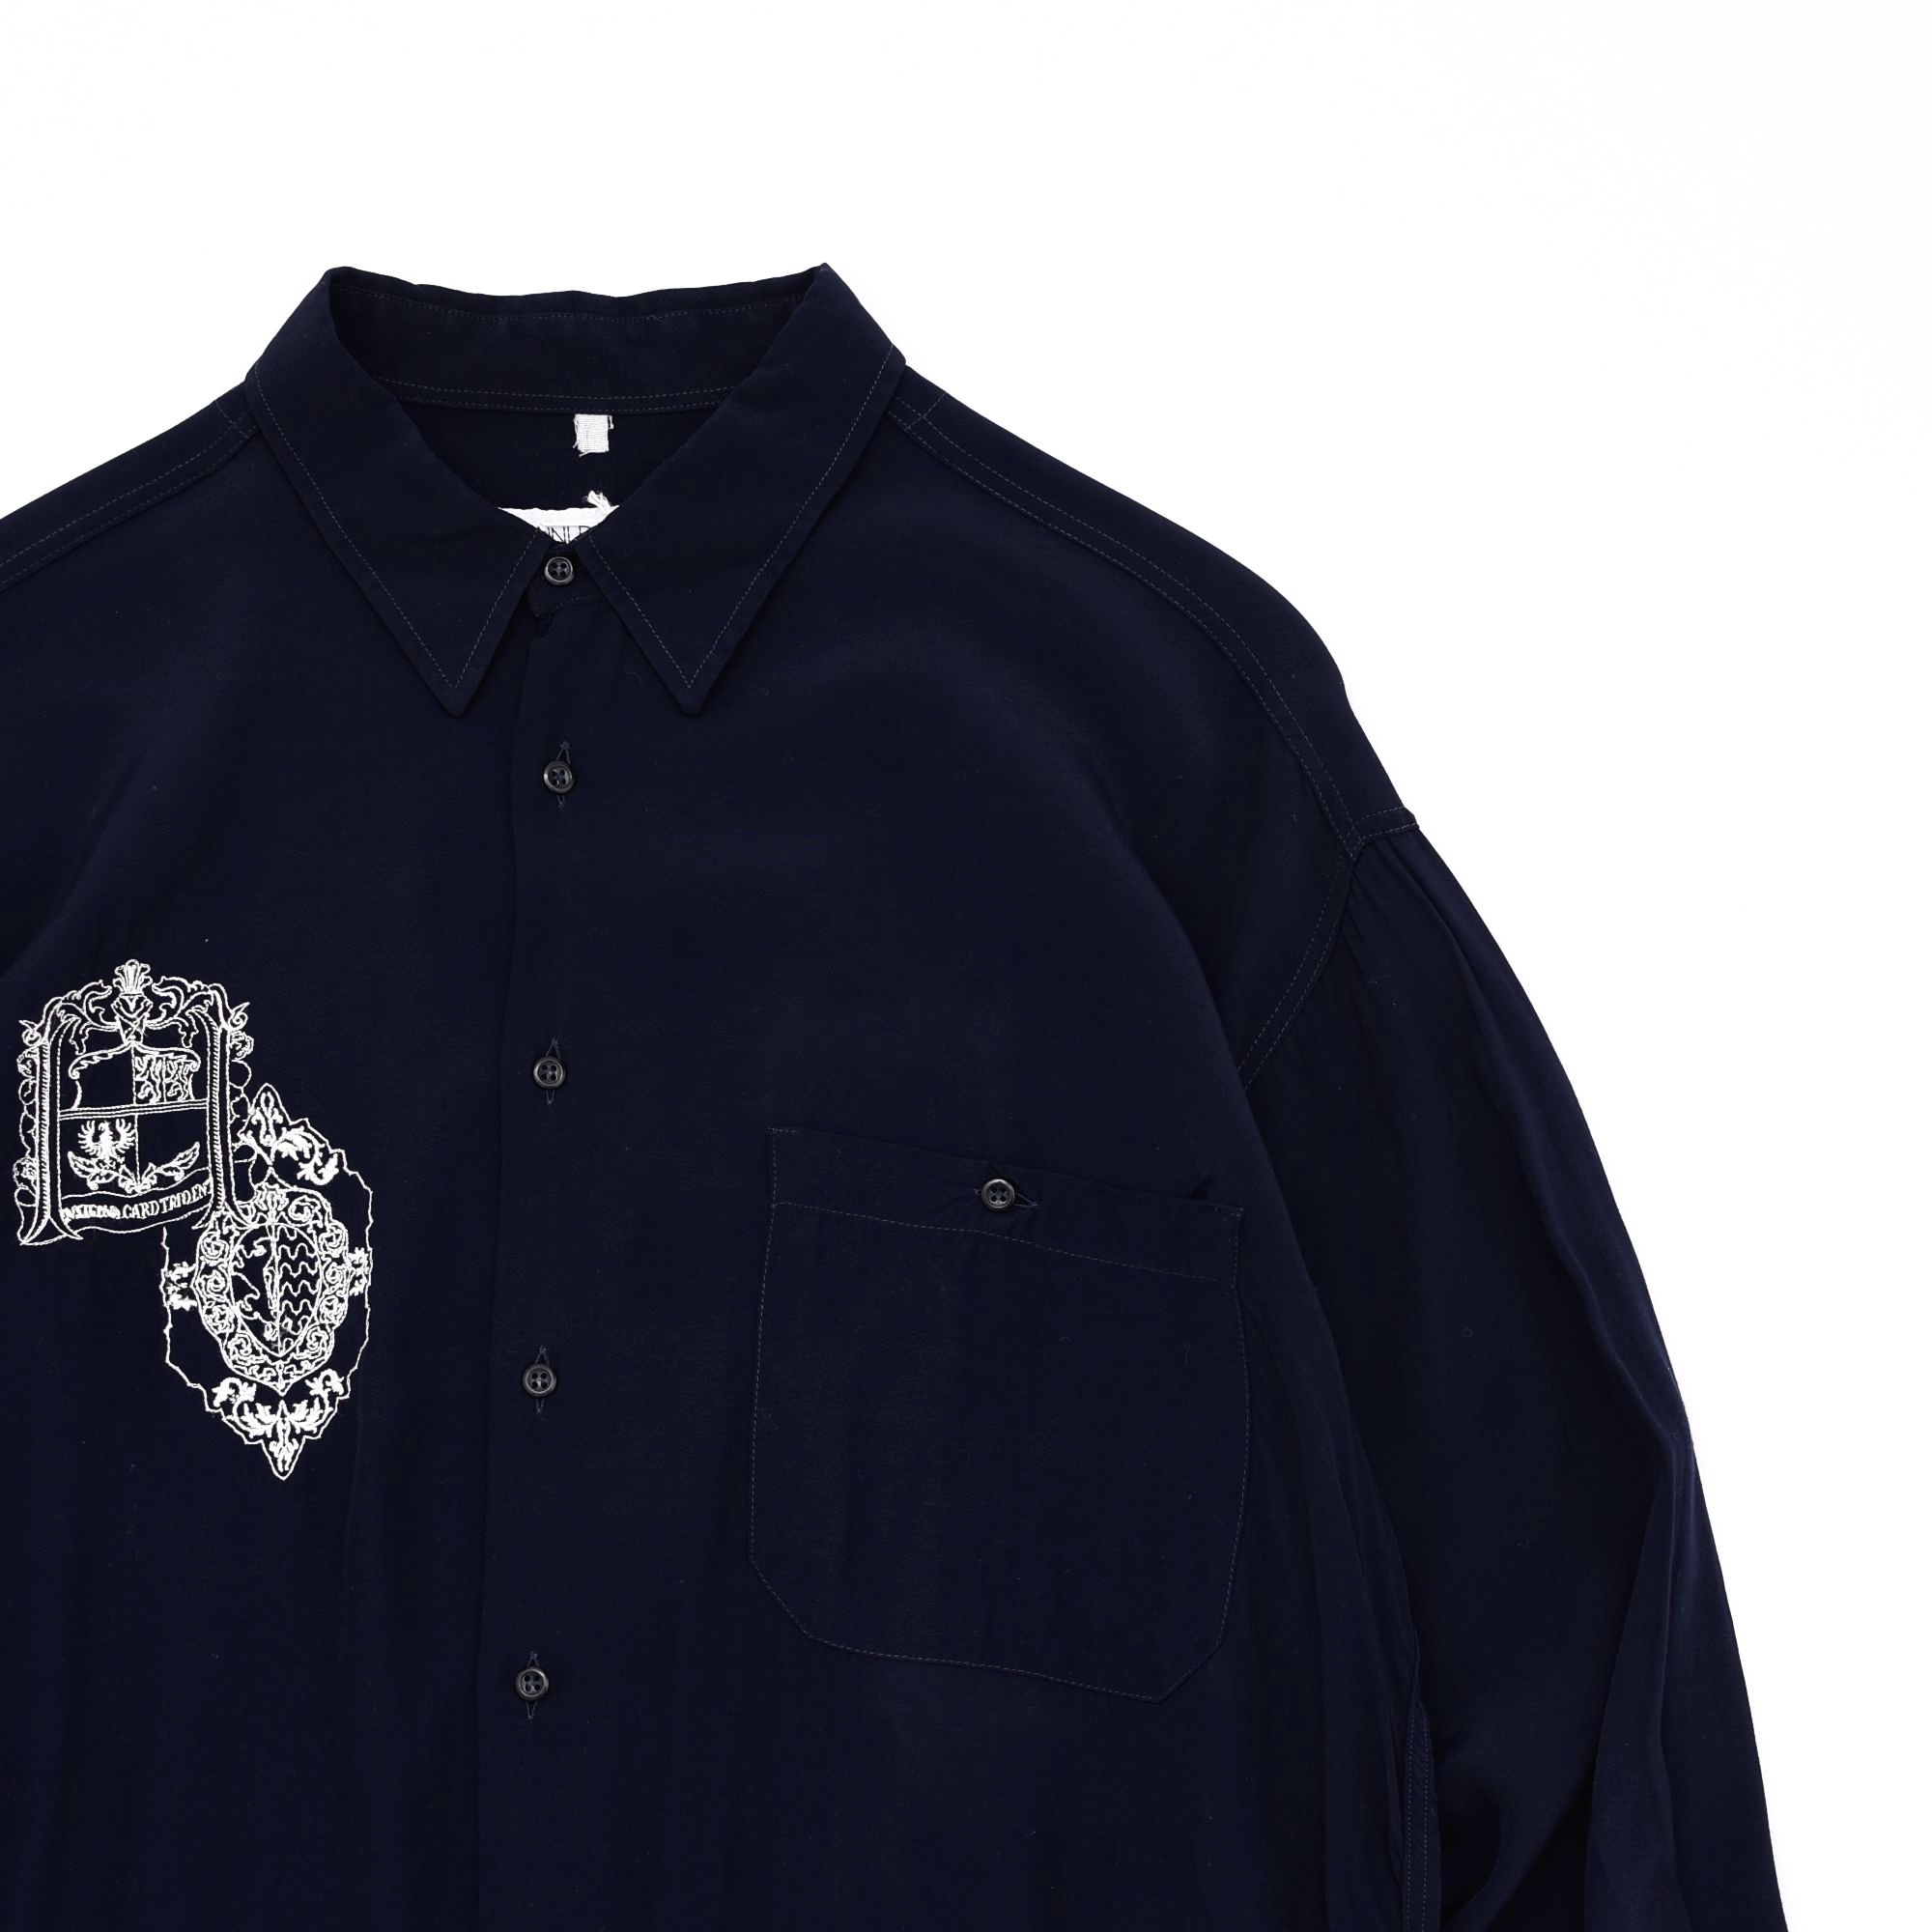 Made in Italy GIANNI BOLLINI rayon shirt